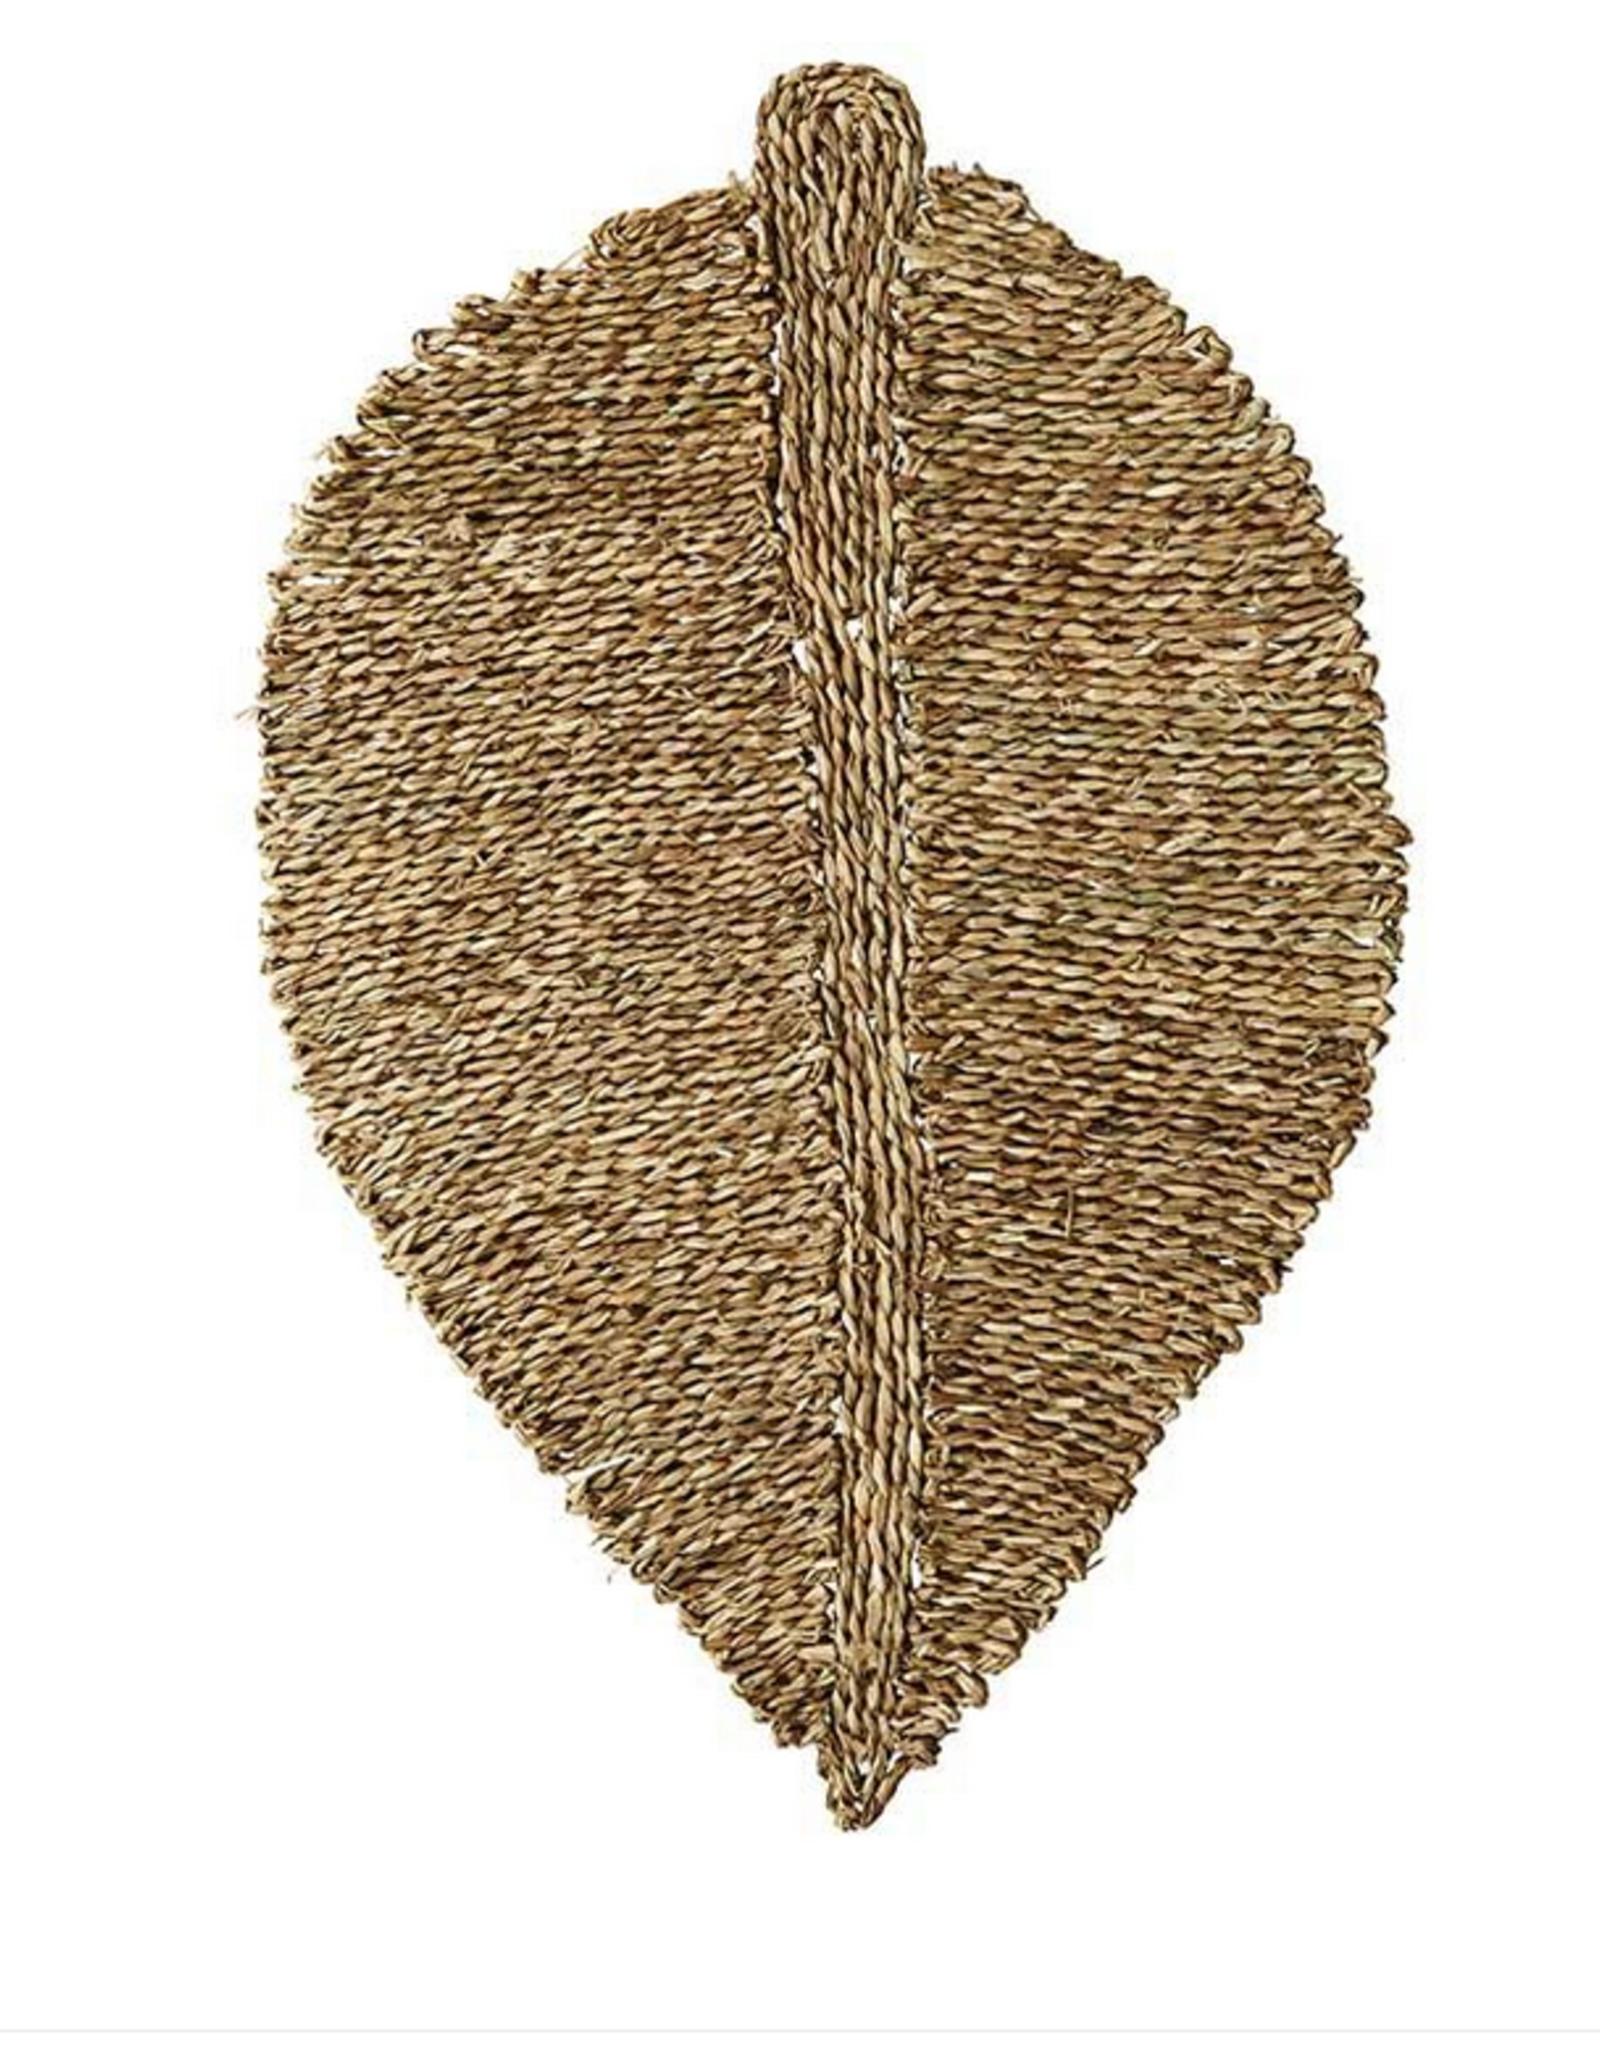 Madam Stoltz Madam Stoltz - Sea grass doormat - 80x52 cm